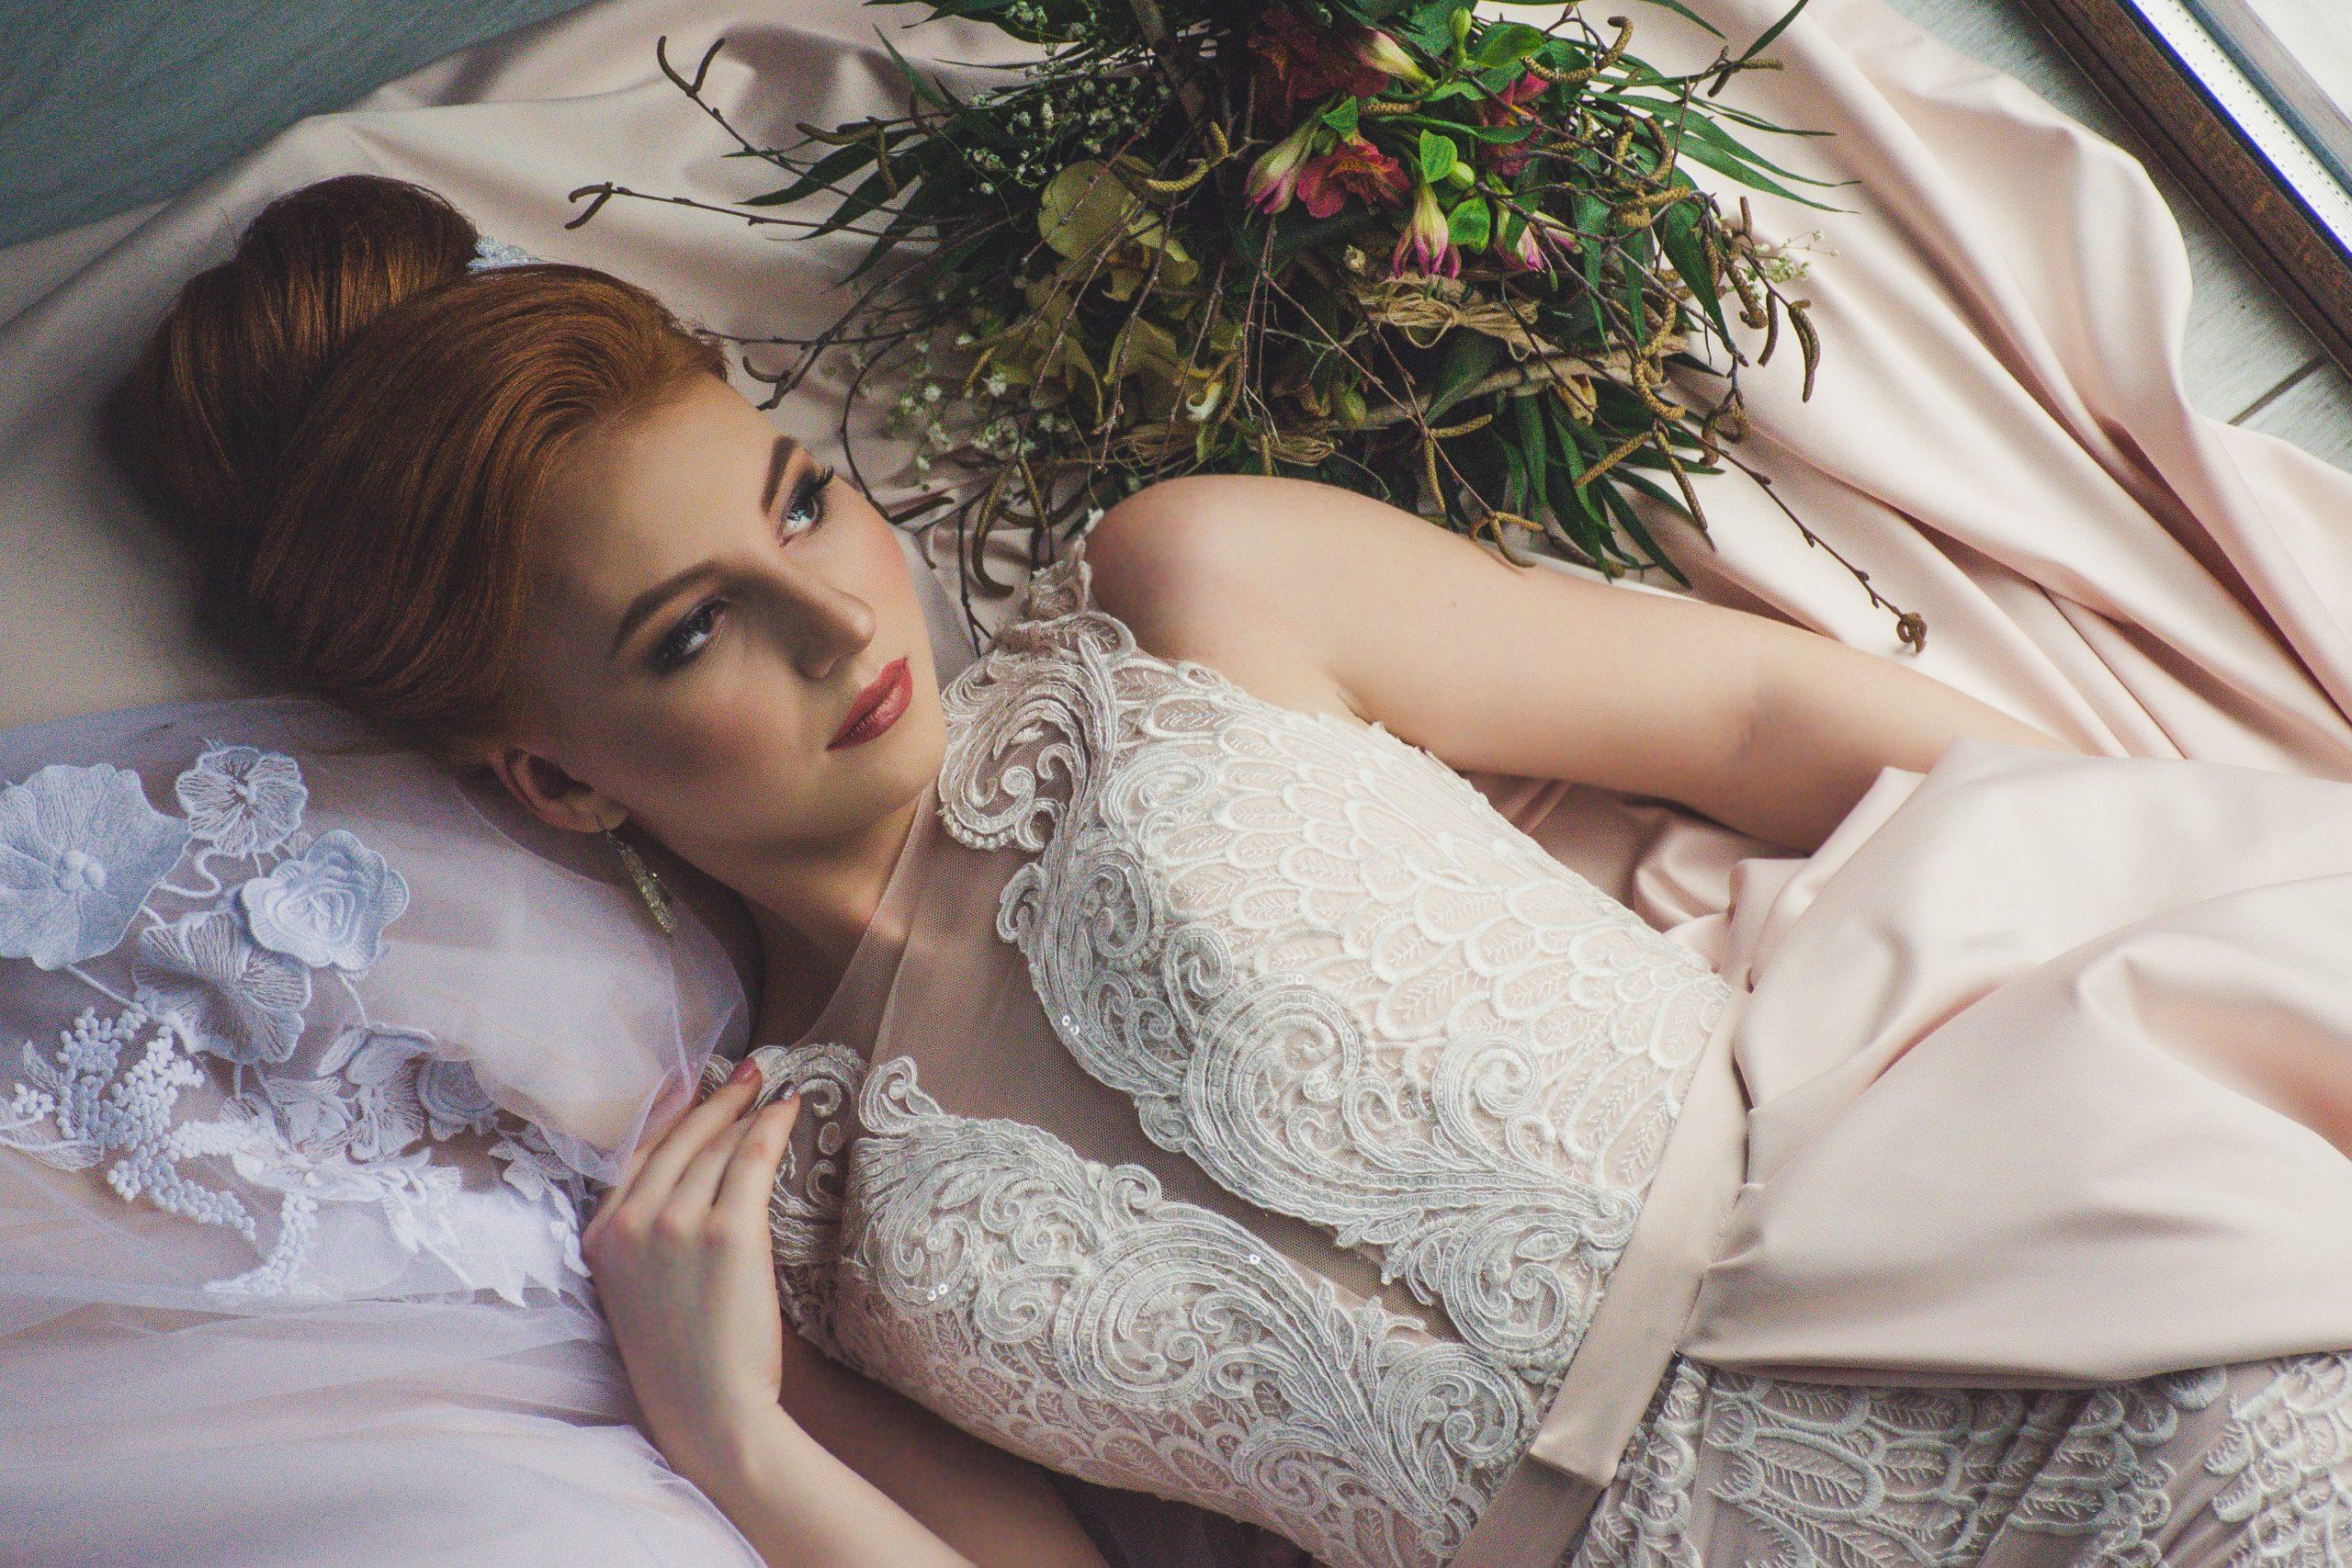 Boudoir Bride laying confValerie elash